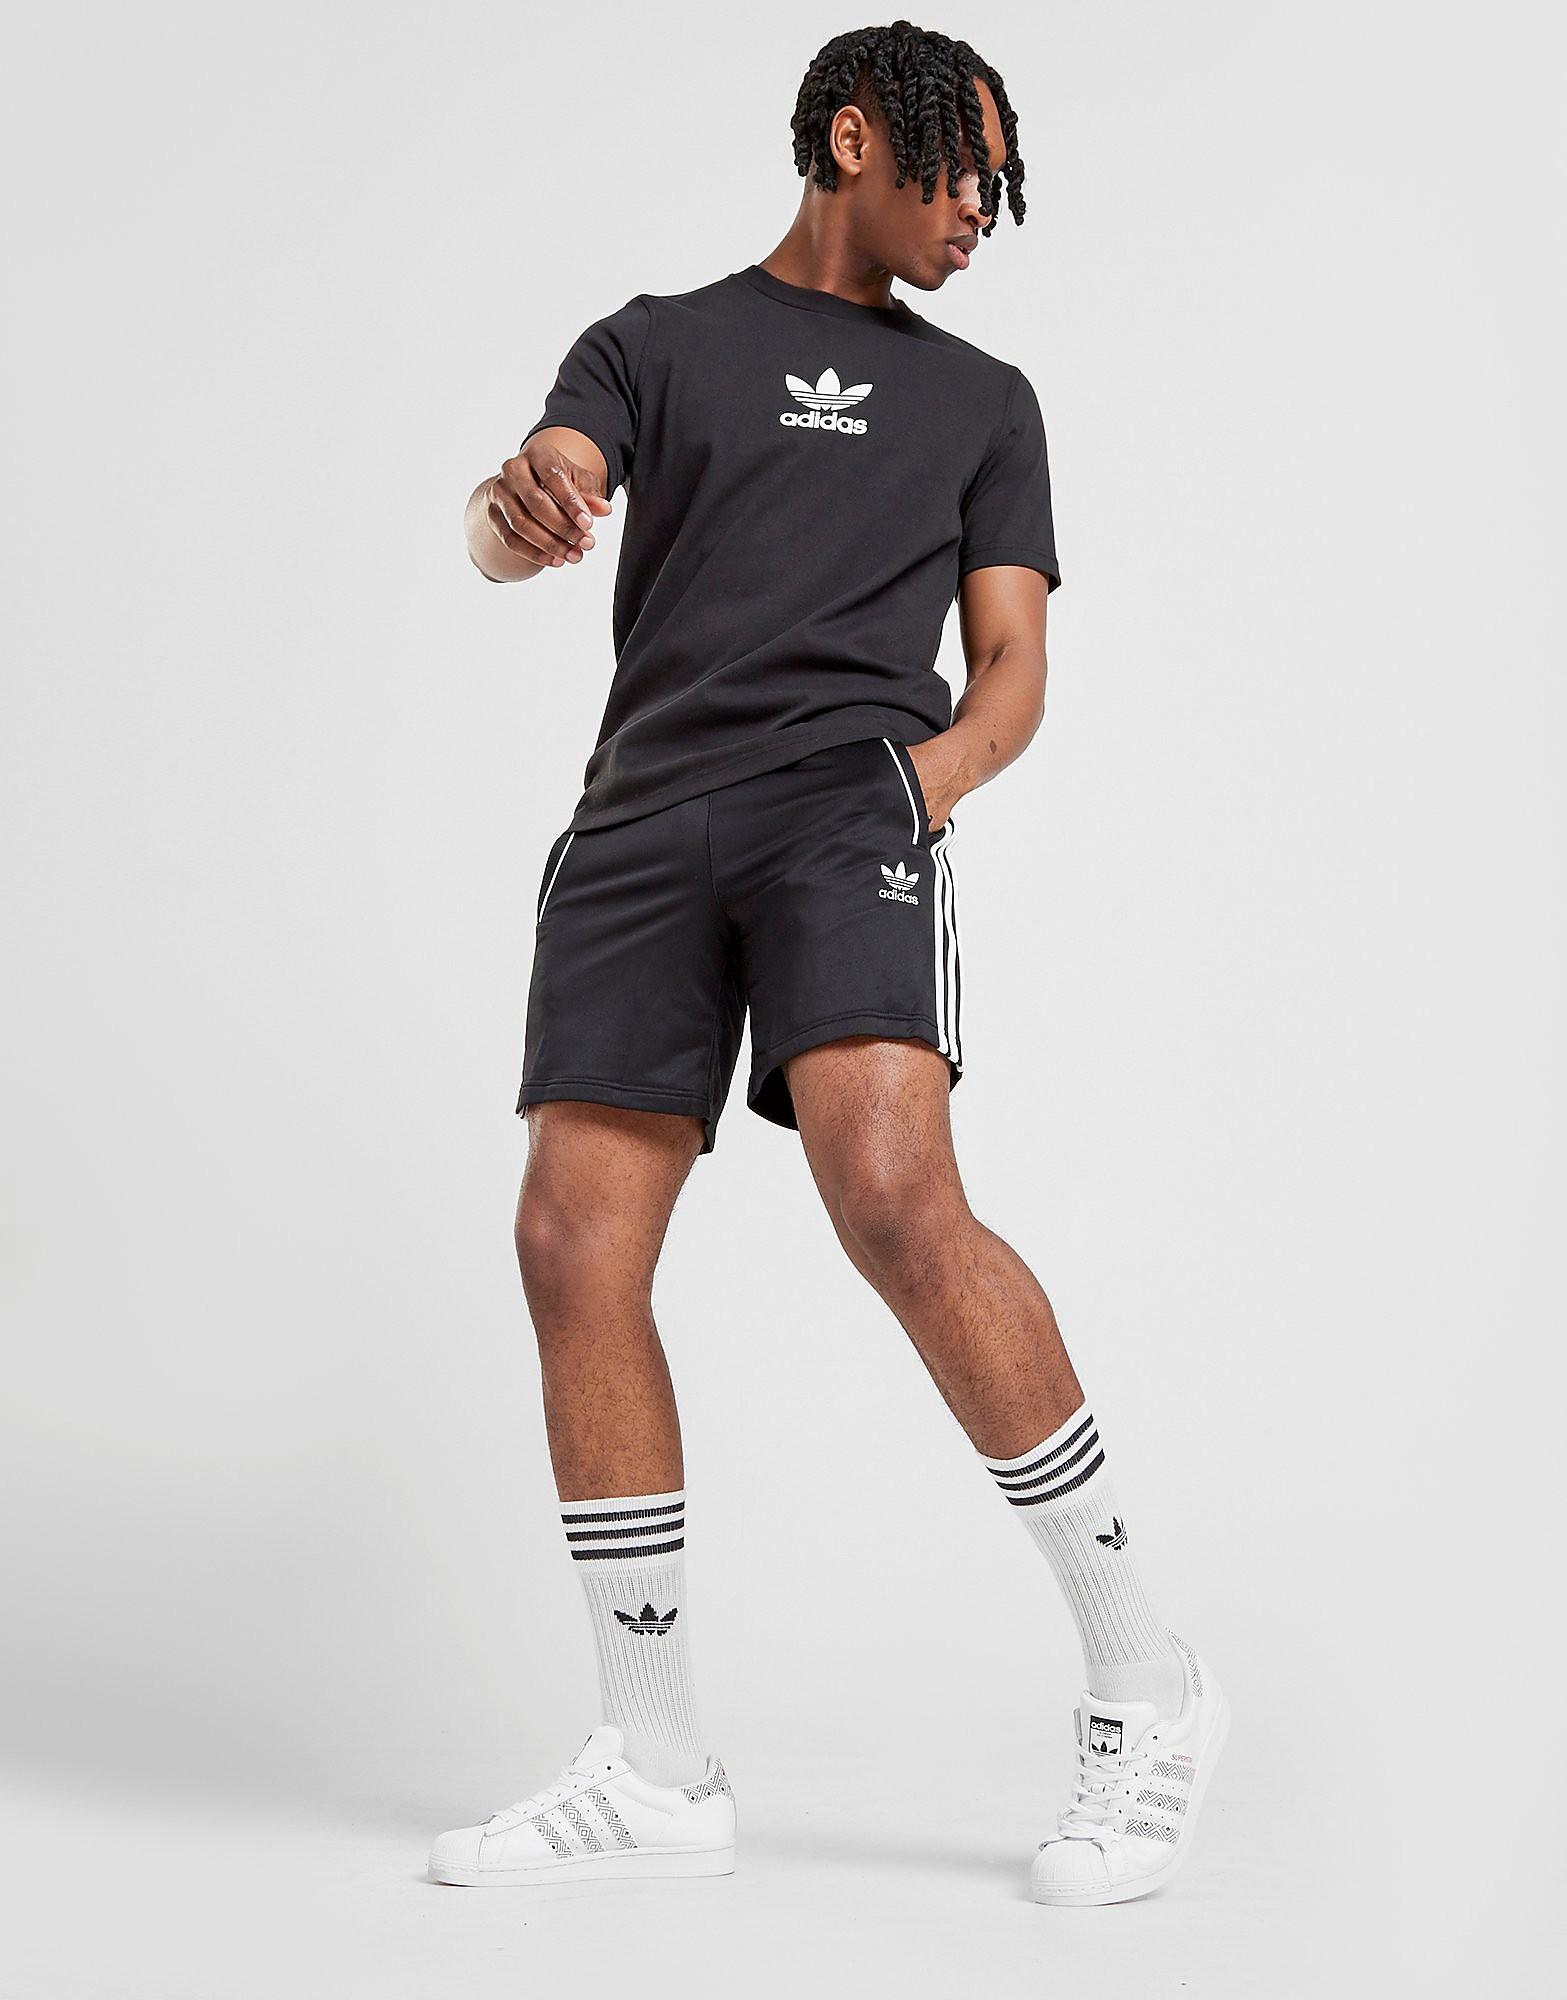 adidas Originals Superstar Shorts alleen bij JD Zwart Heren Zwart